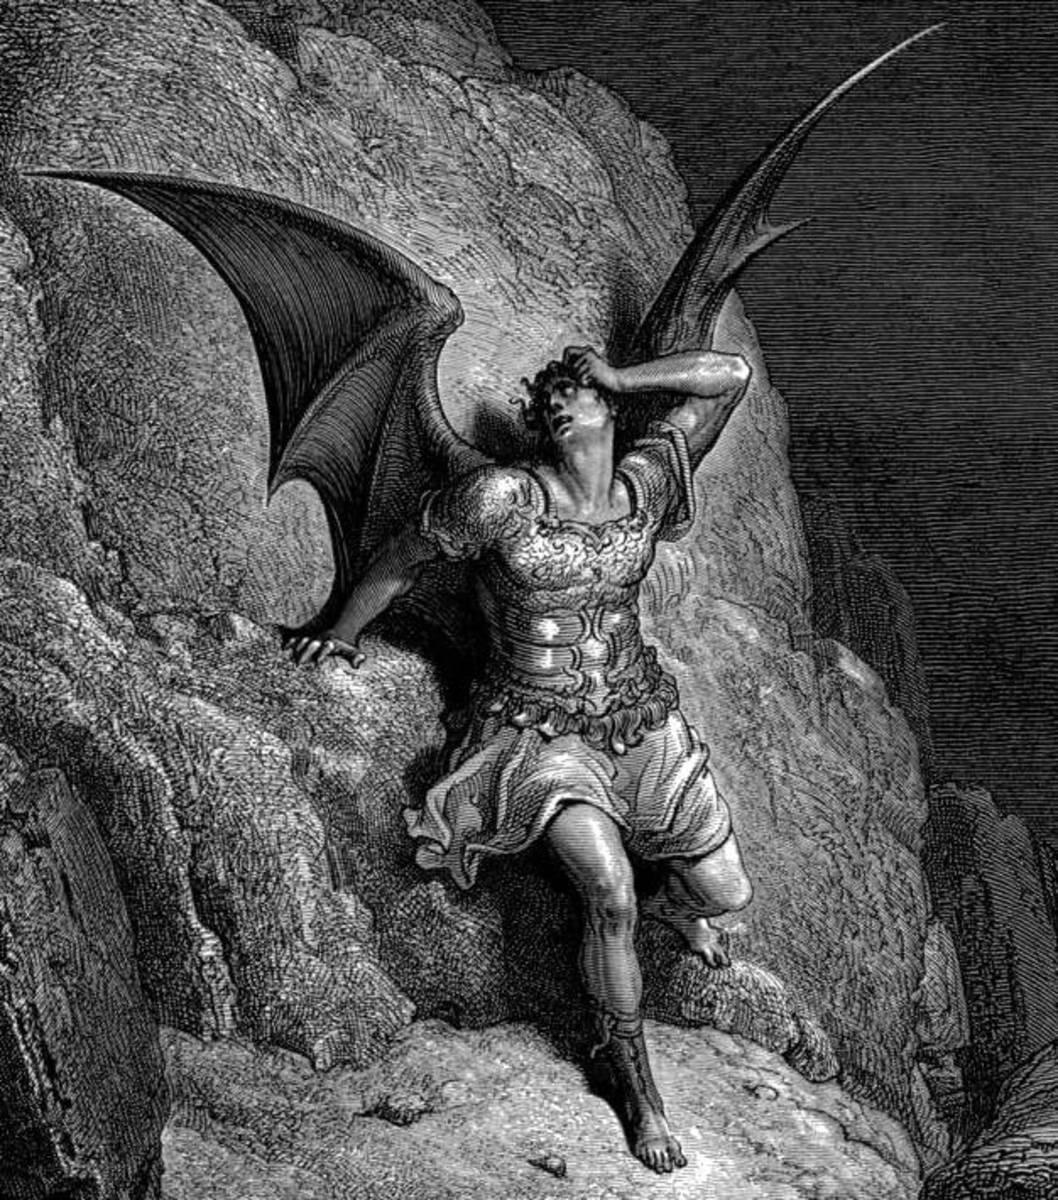 Characteristics and Traits of Demons